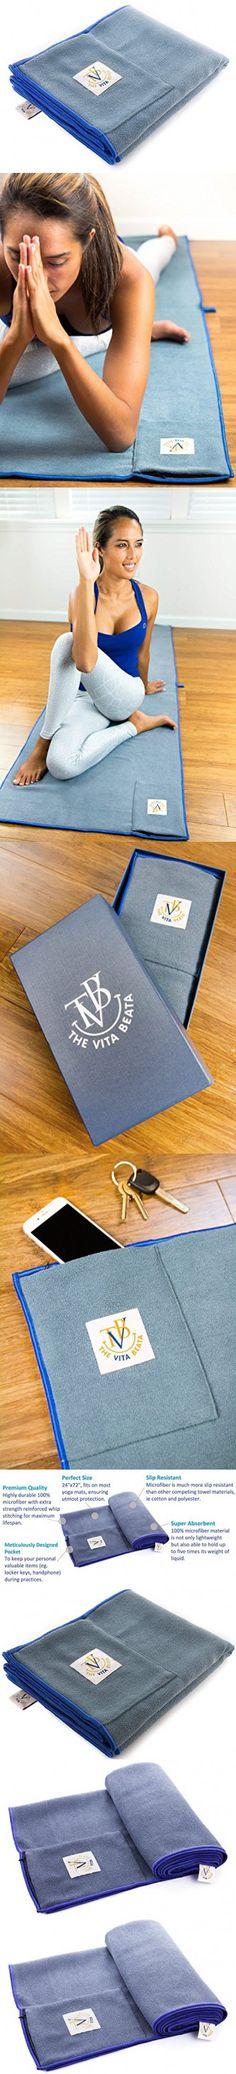 "Luxurious Hot Yoga Towel by TVB - Microfiber Yoga Mat Towel with Zipper Pocket and Gift Box, Non Slip with Grip, Skidless - Ideal Bikram Yoga Towel, Ashtanga, Vinyasa - Super Absorbent (24""X72"")"